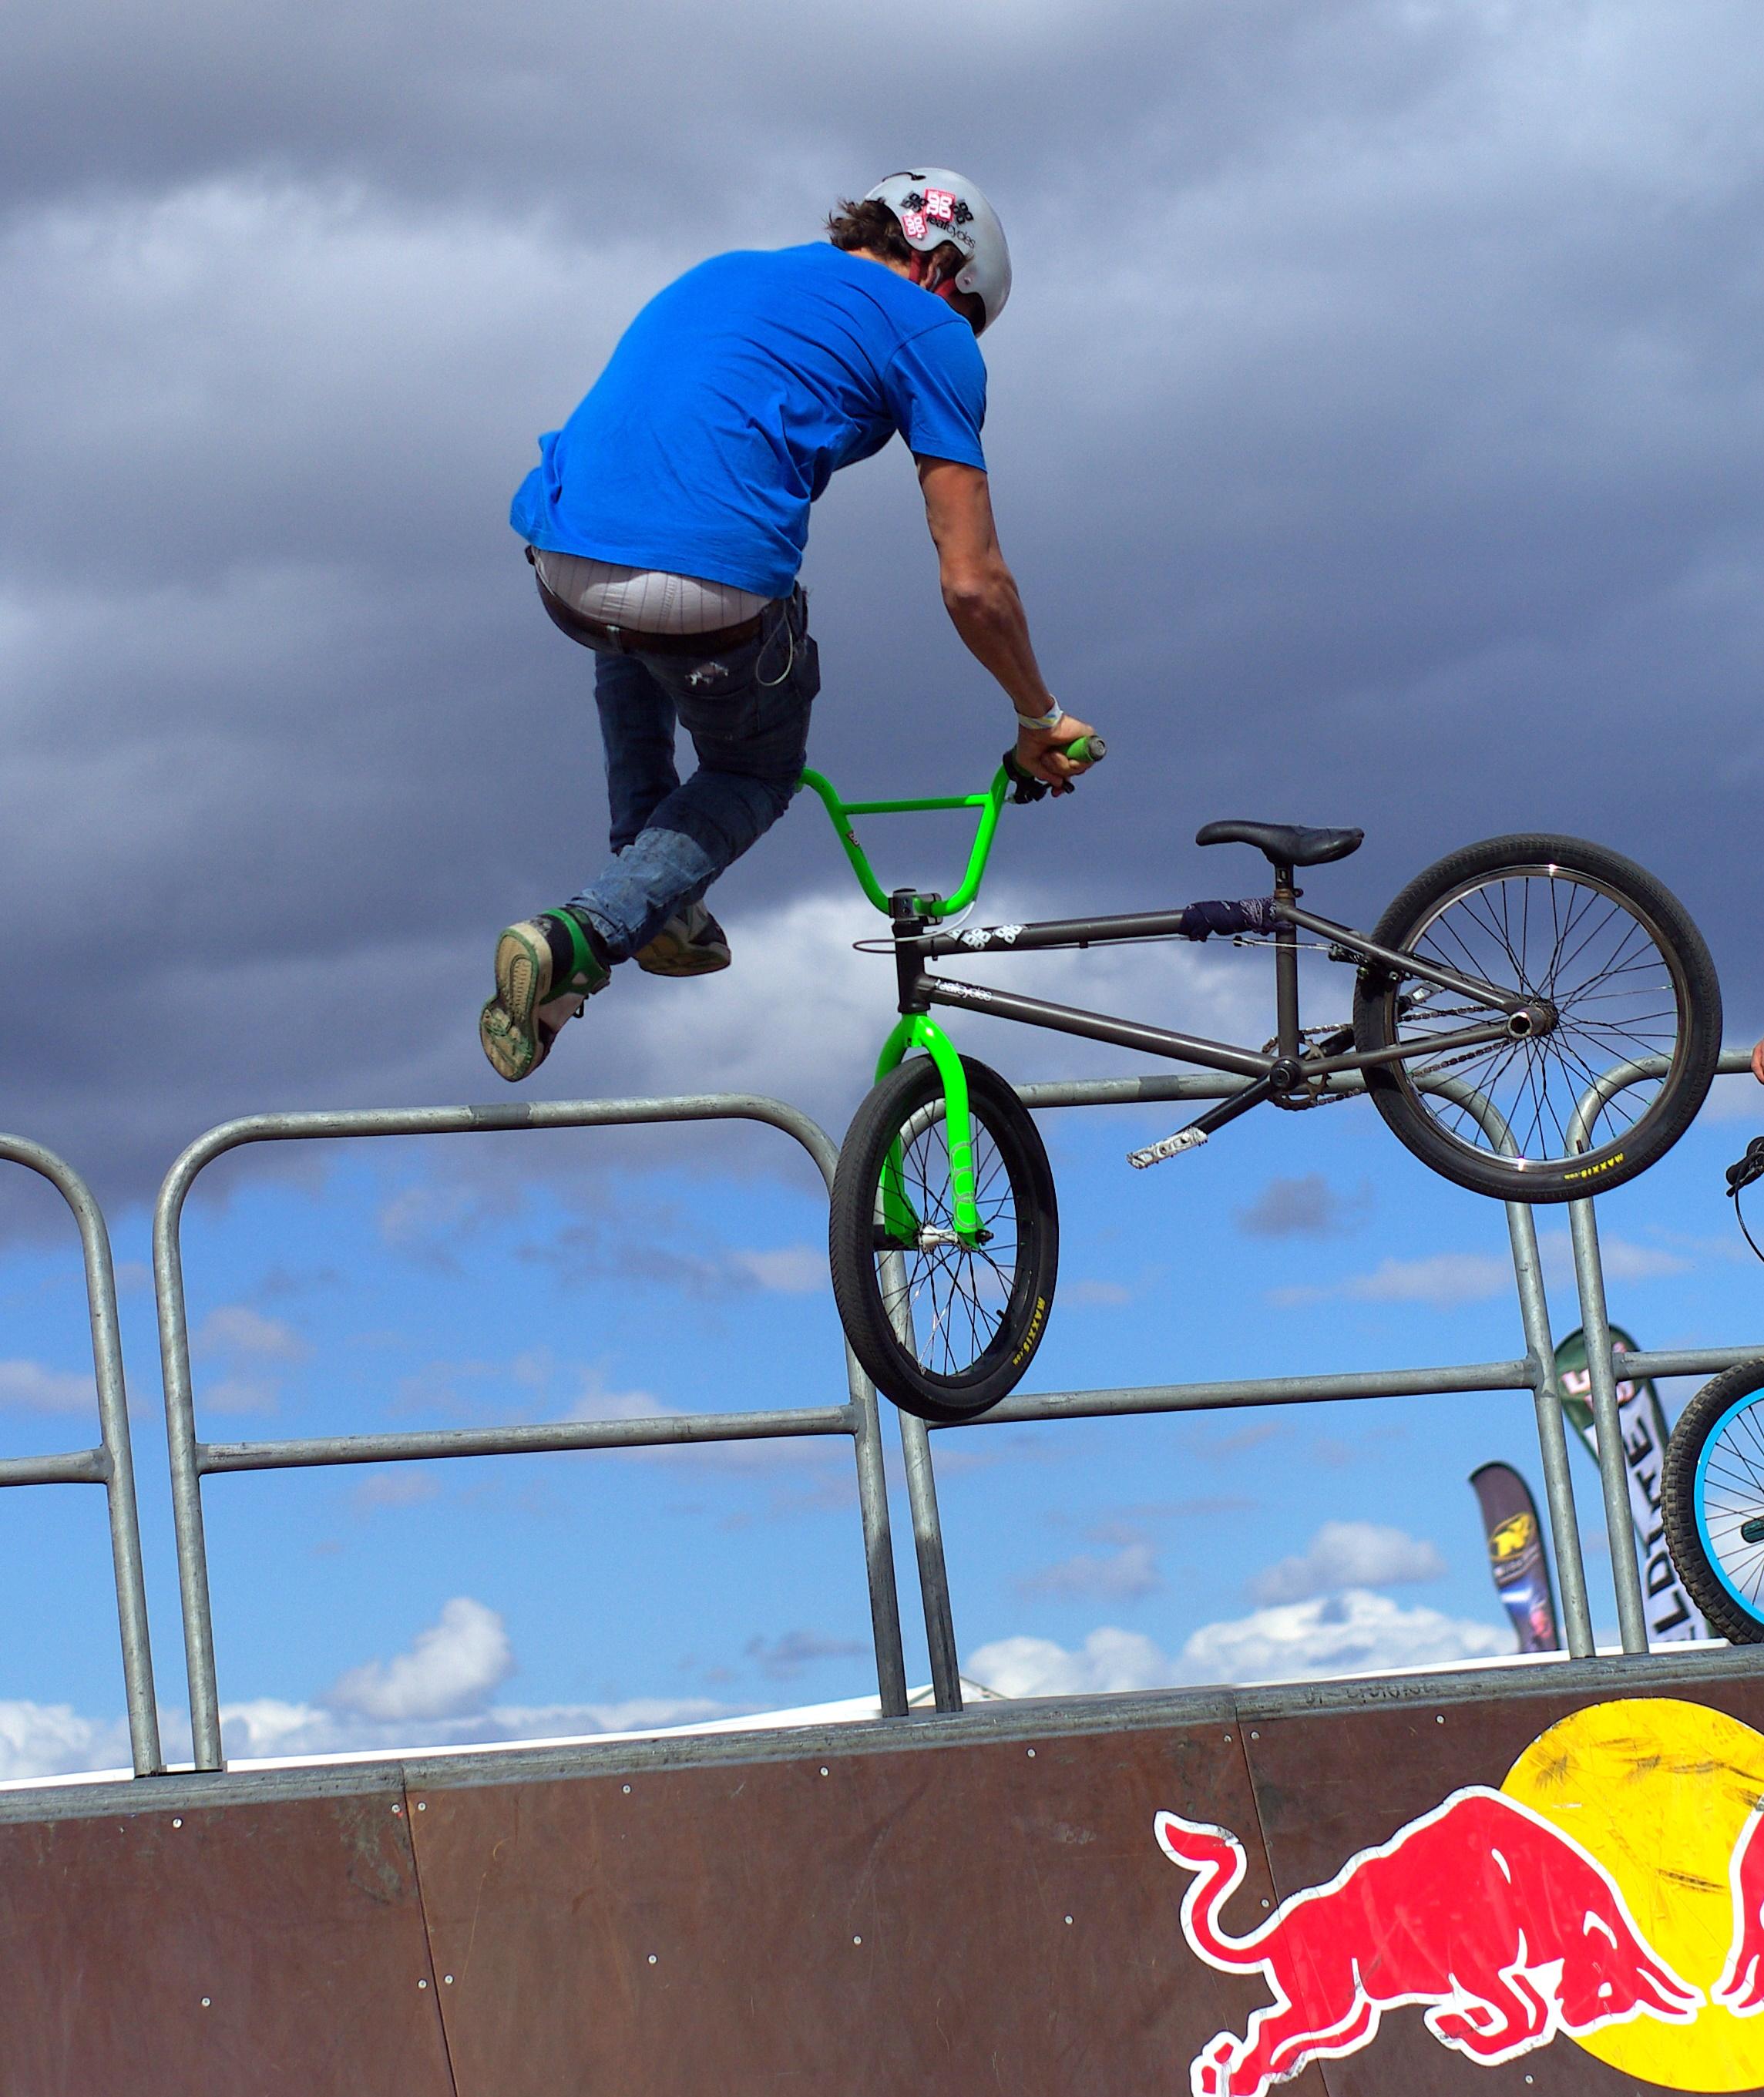 bmx tricks bmx - photo #32